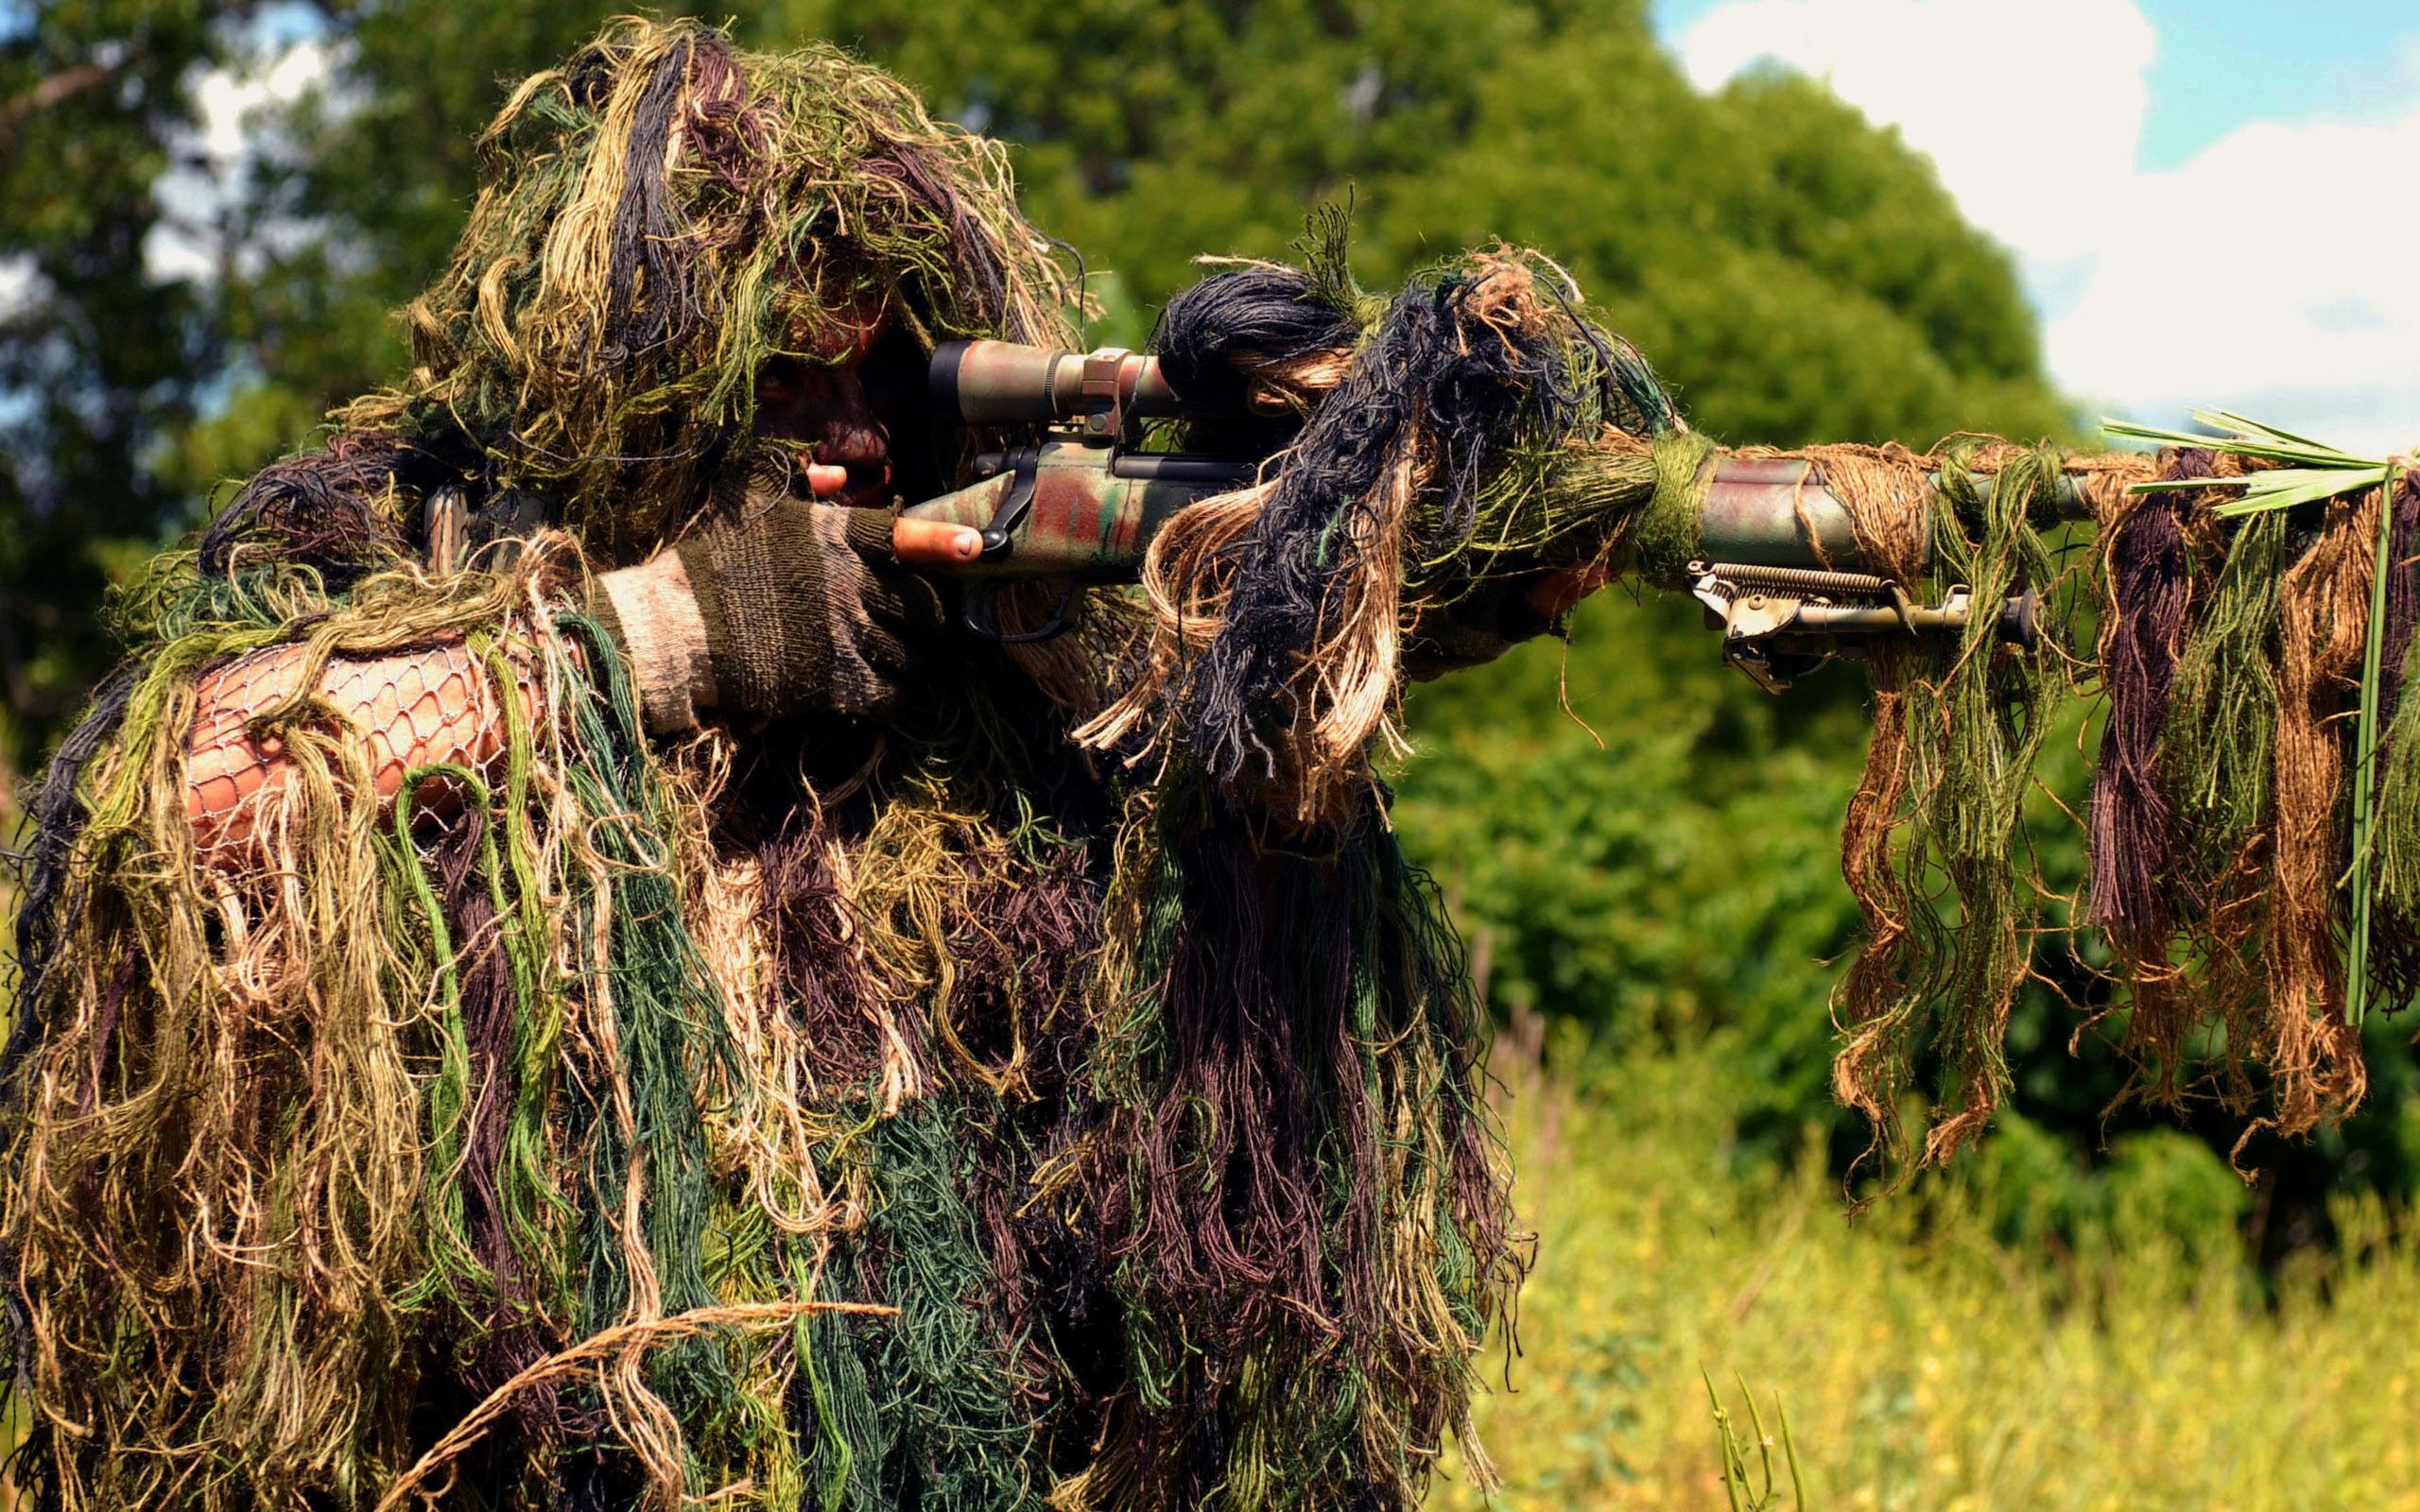 Pubg Wallpaper Ghillie Suit: Sniper HD Wallpaper